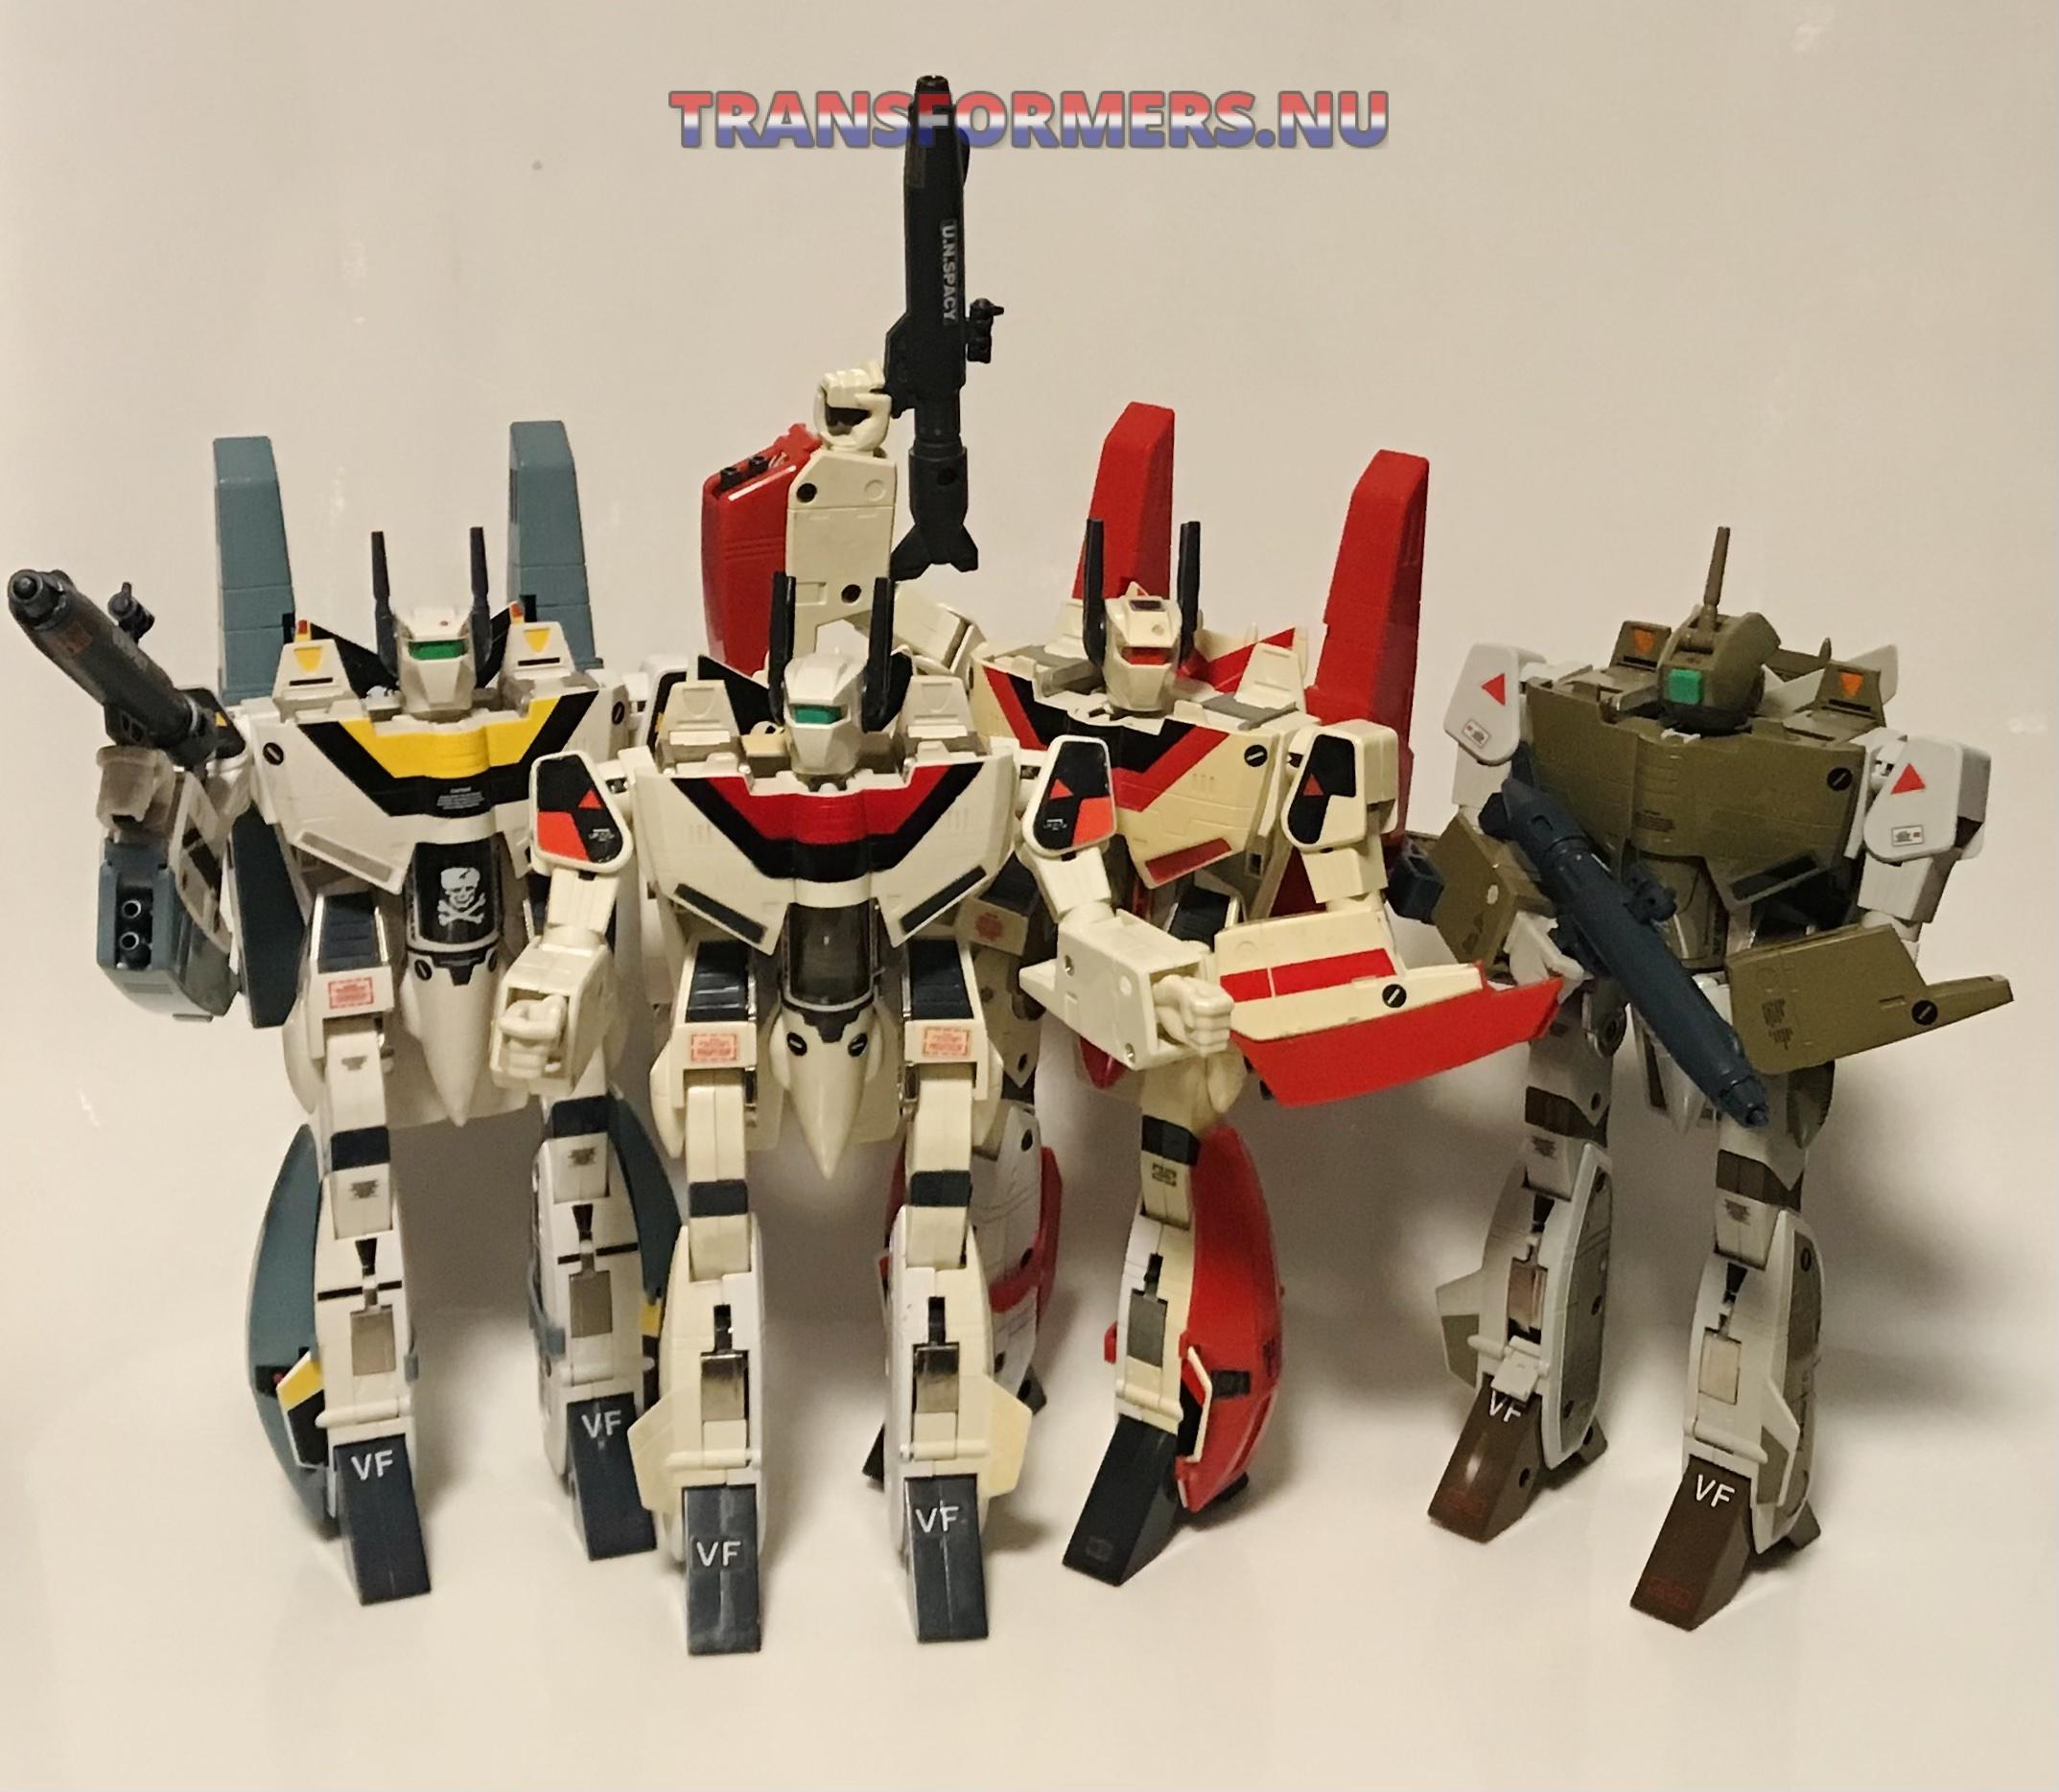 Transformers en Robotech (Macross) image